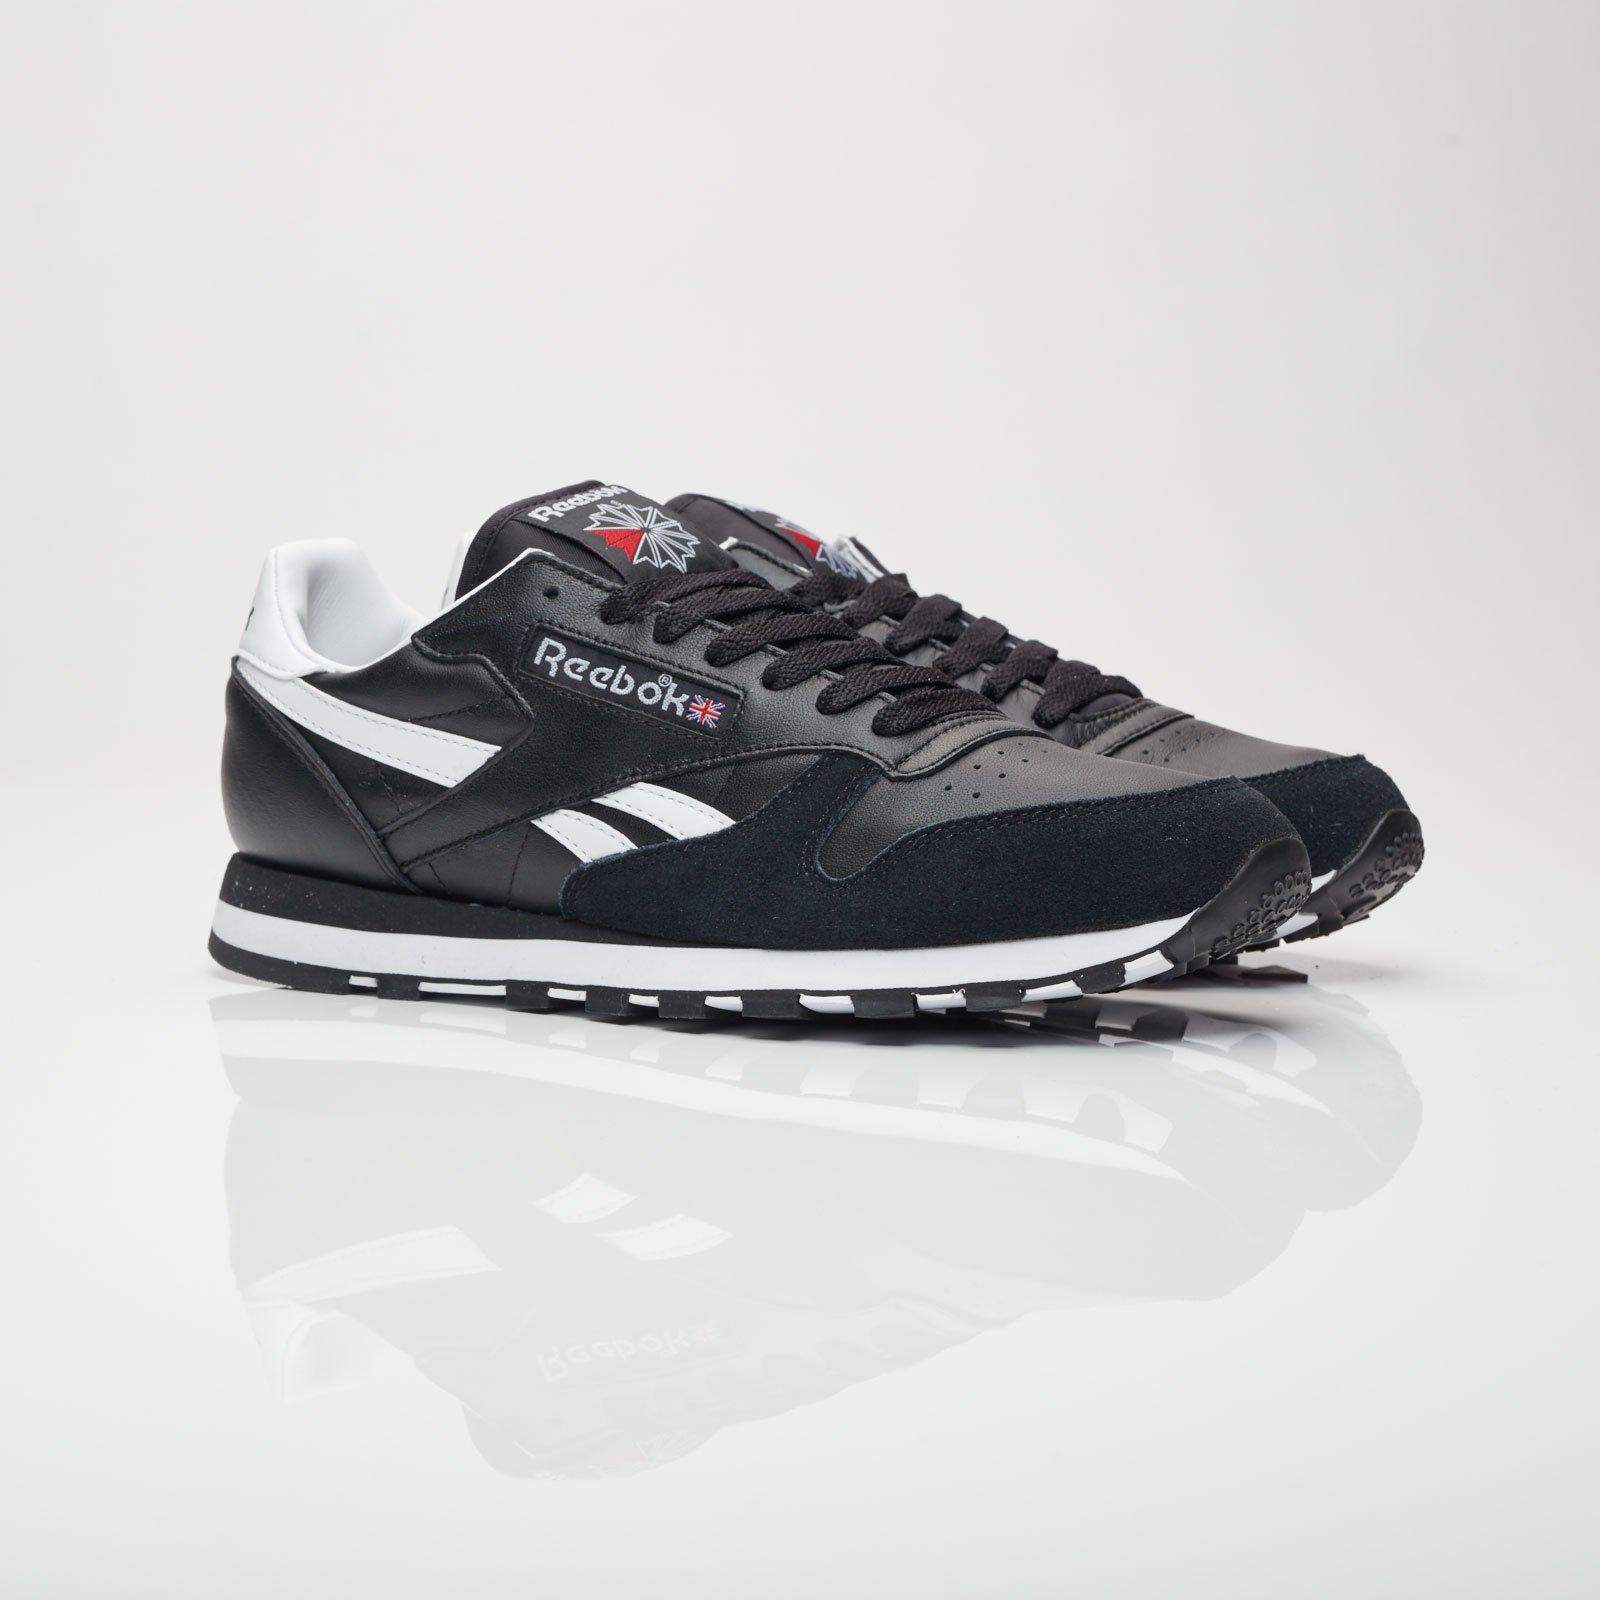 Reebok Classic Bs6515 Sneakersnstuff Et Trc Leather Sneakers rrqUA